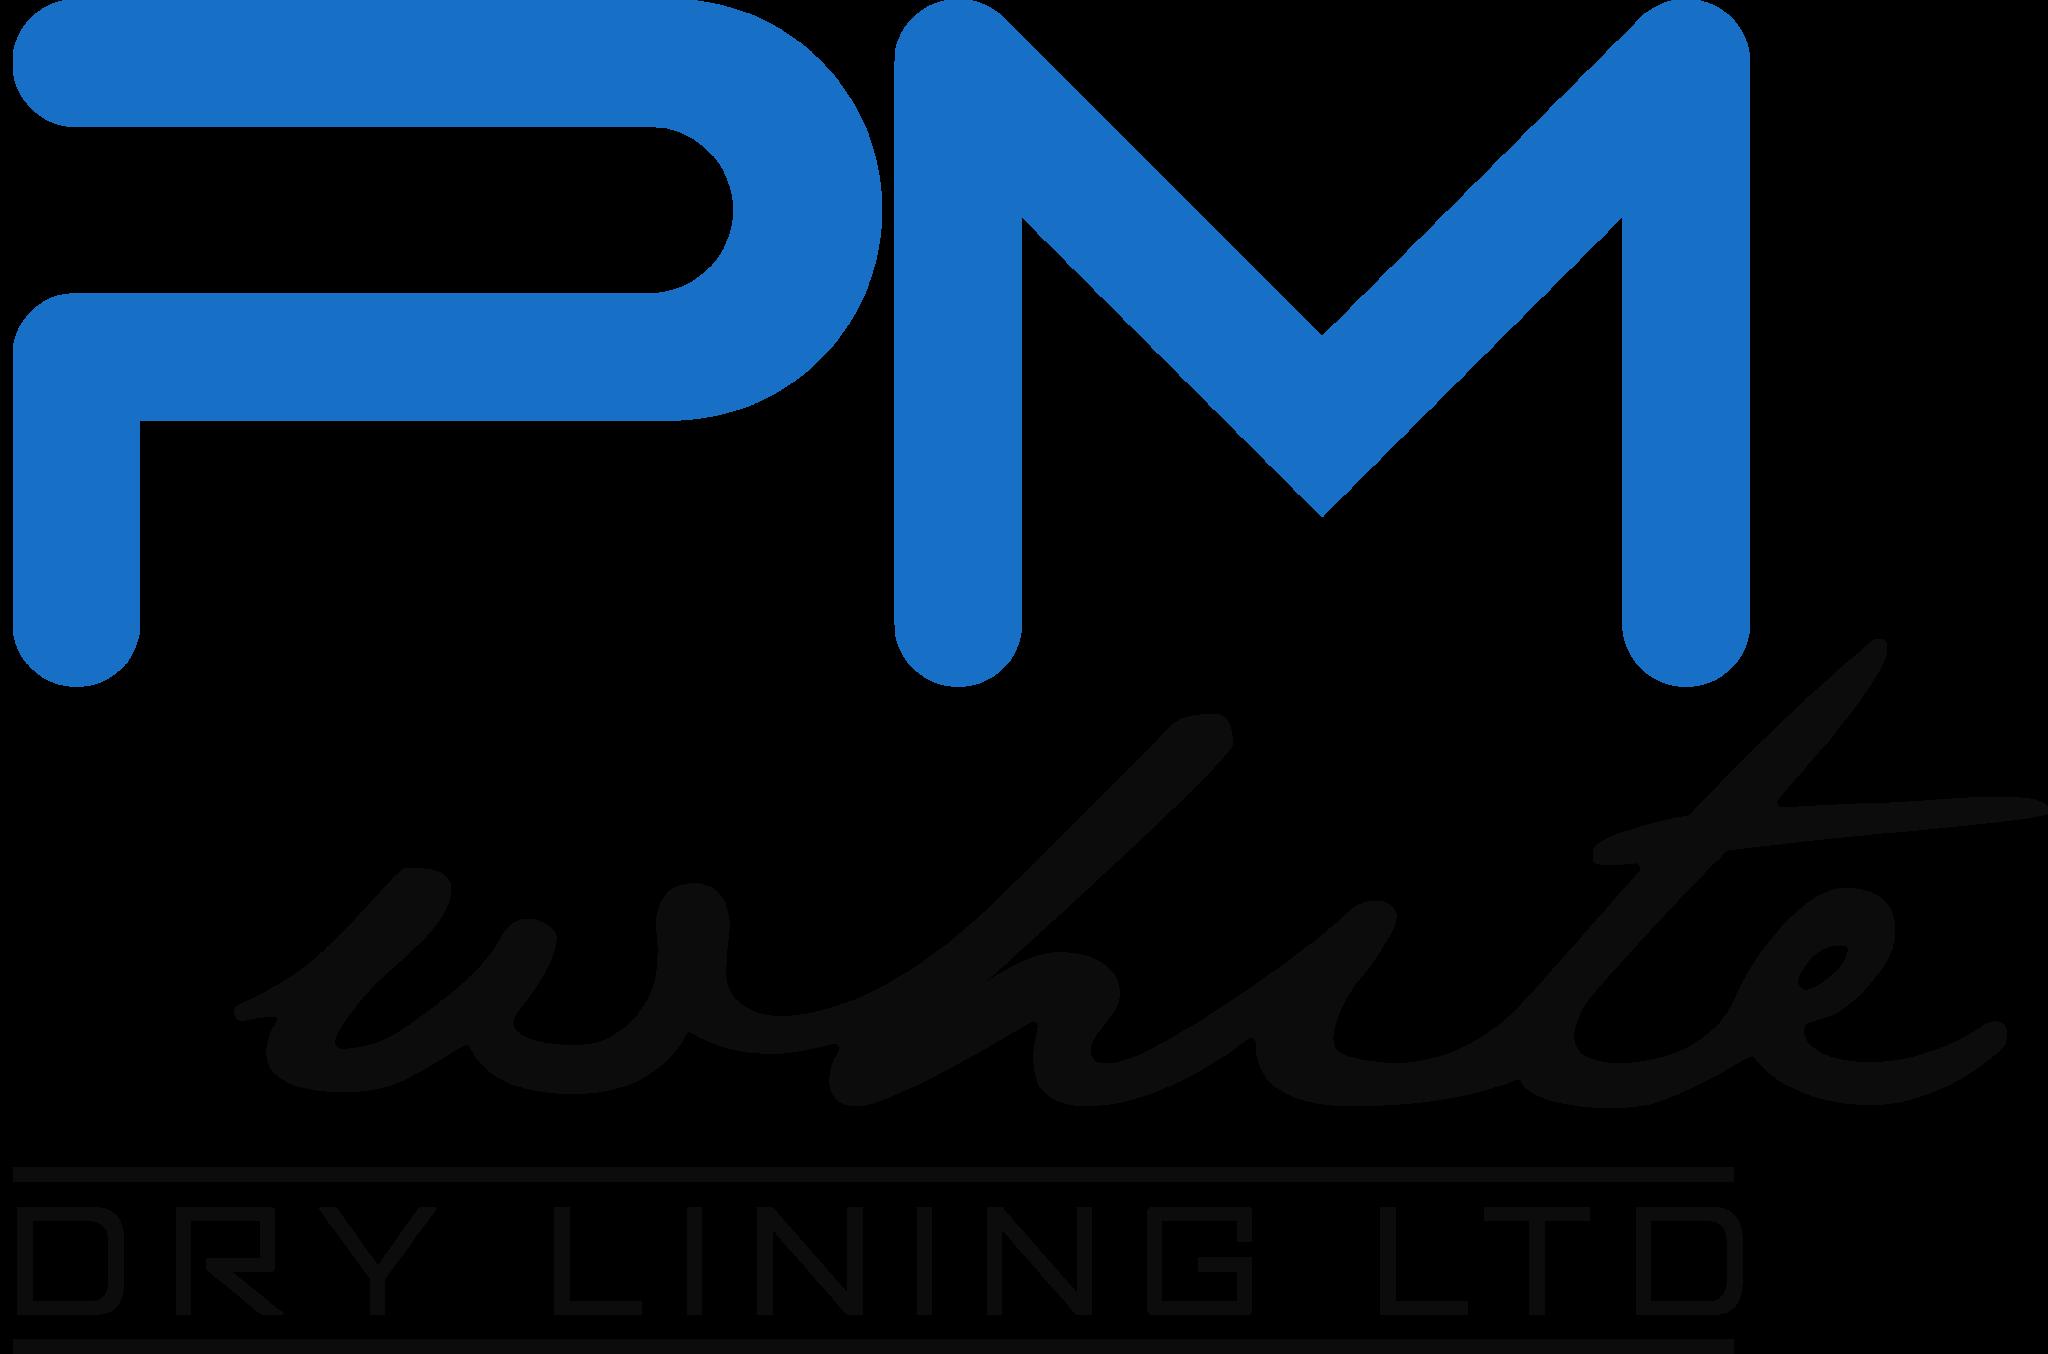 PM White Dry Lining